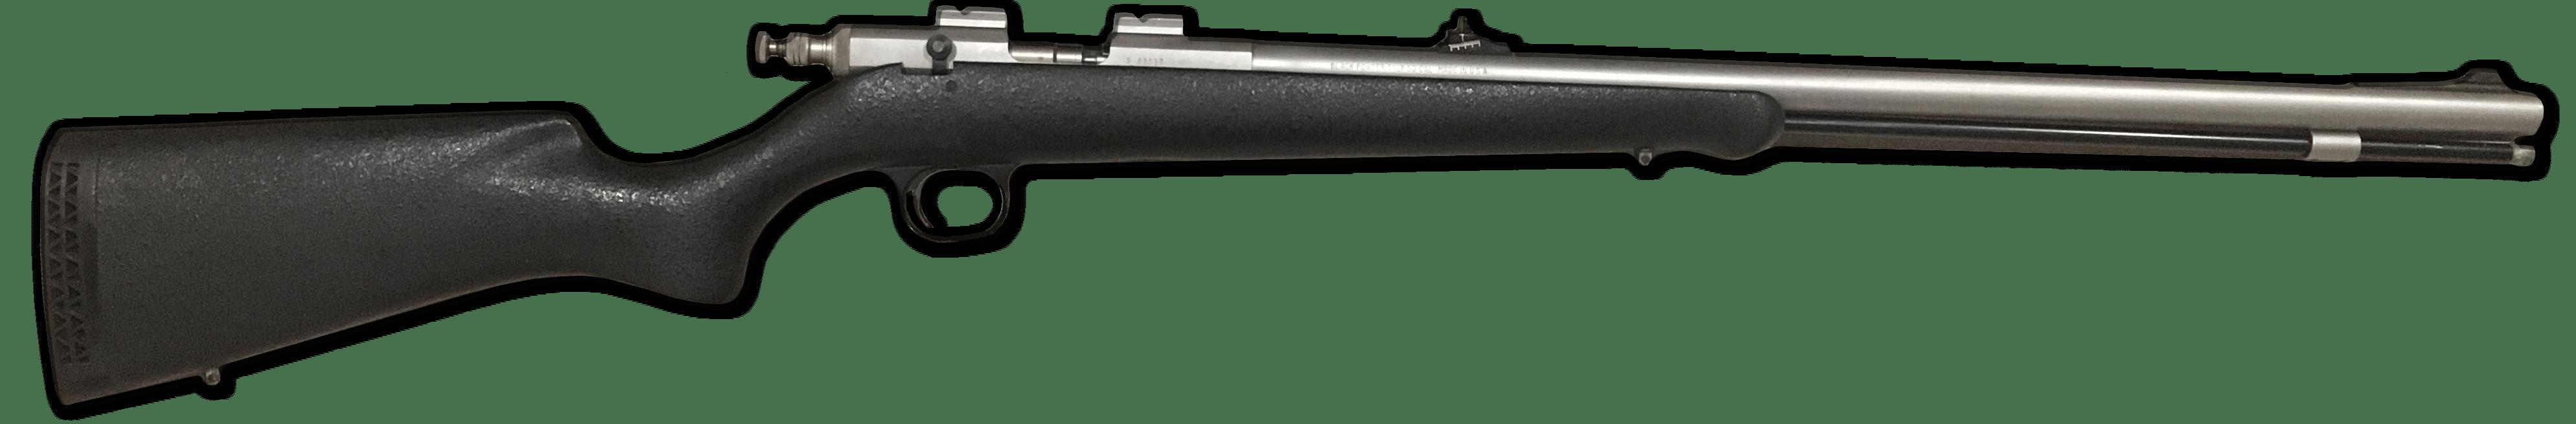 Muzzleloaders mk-85